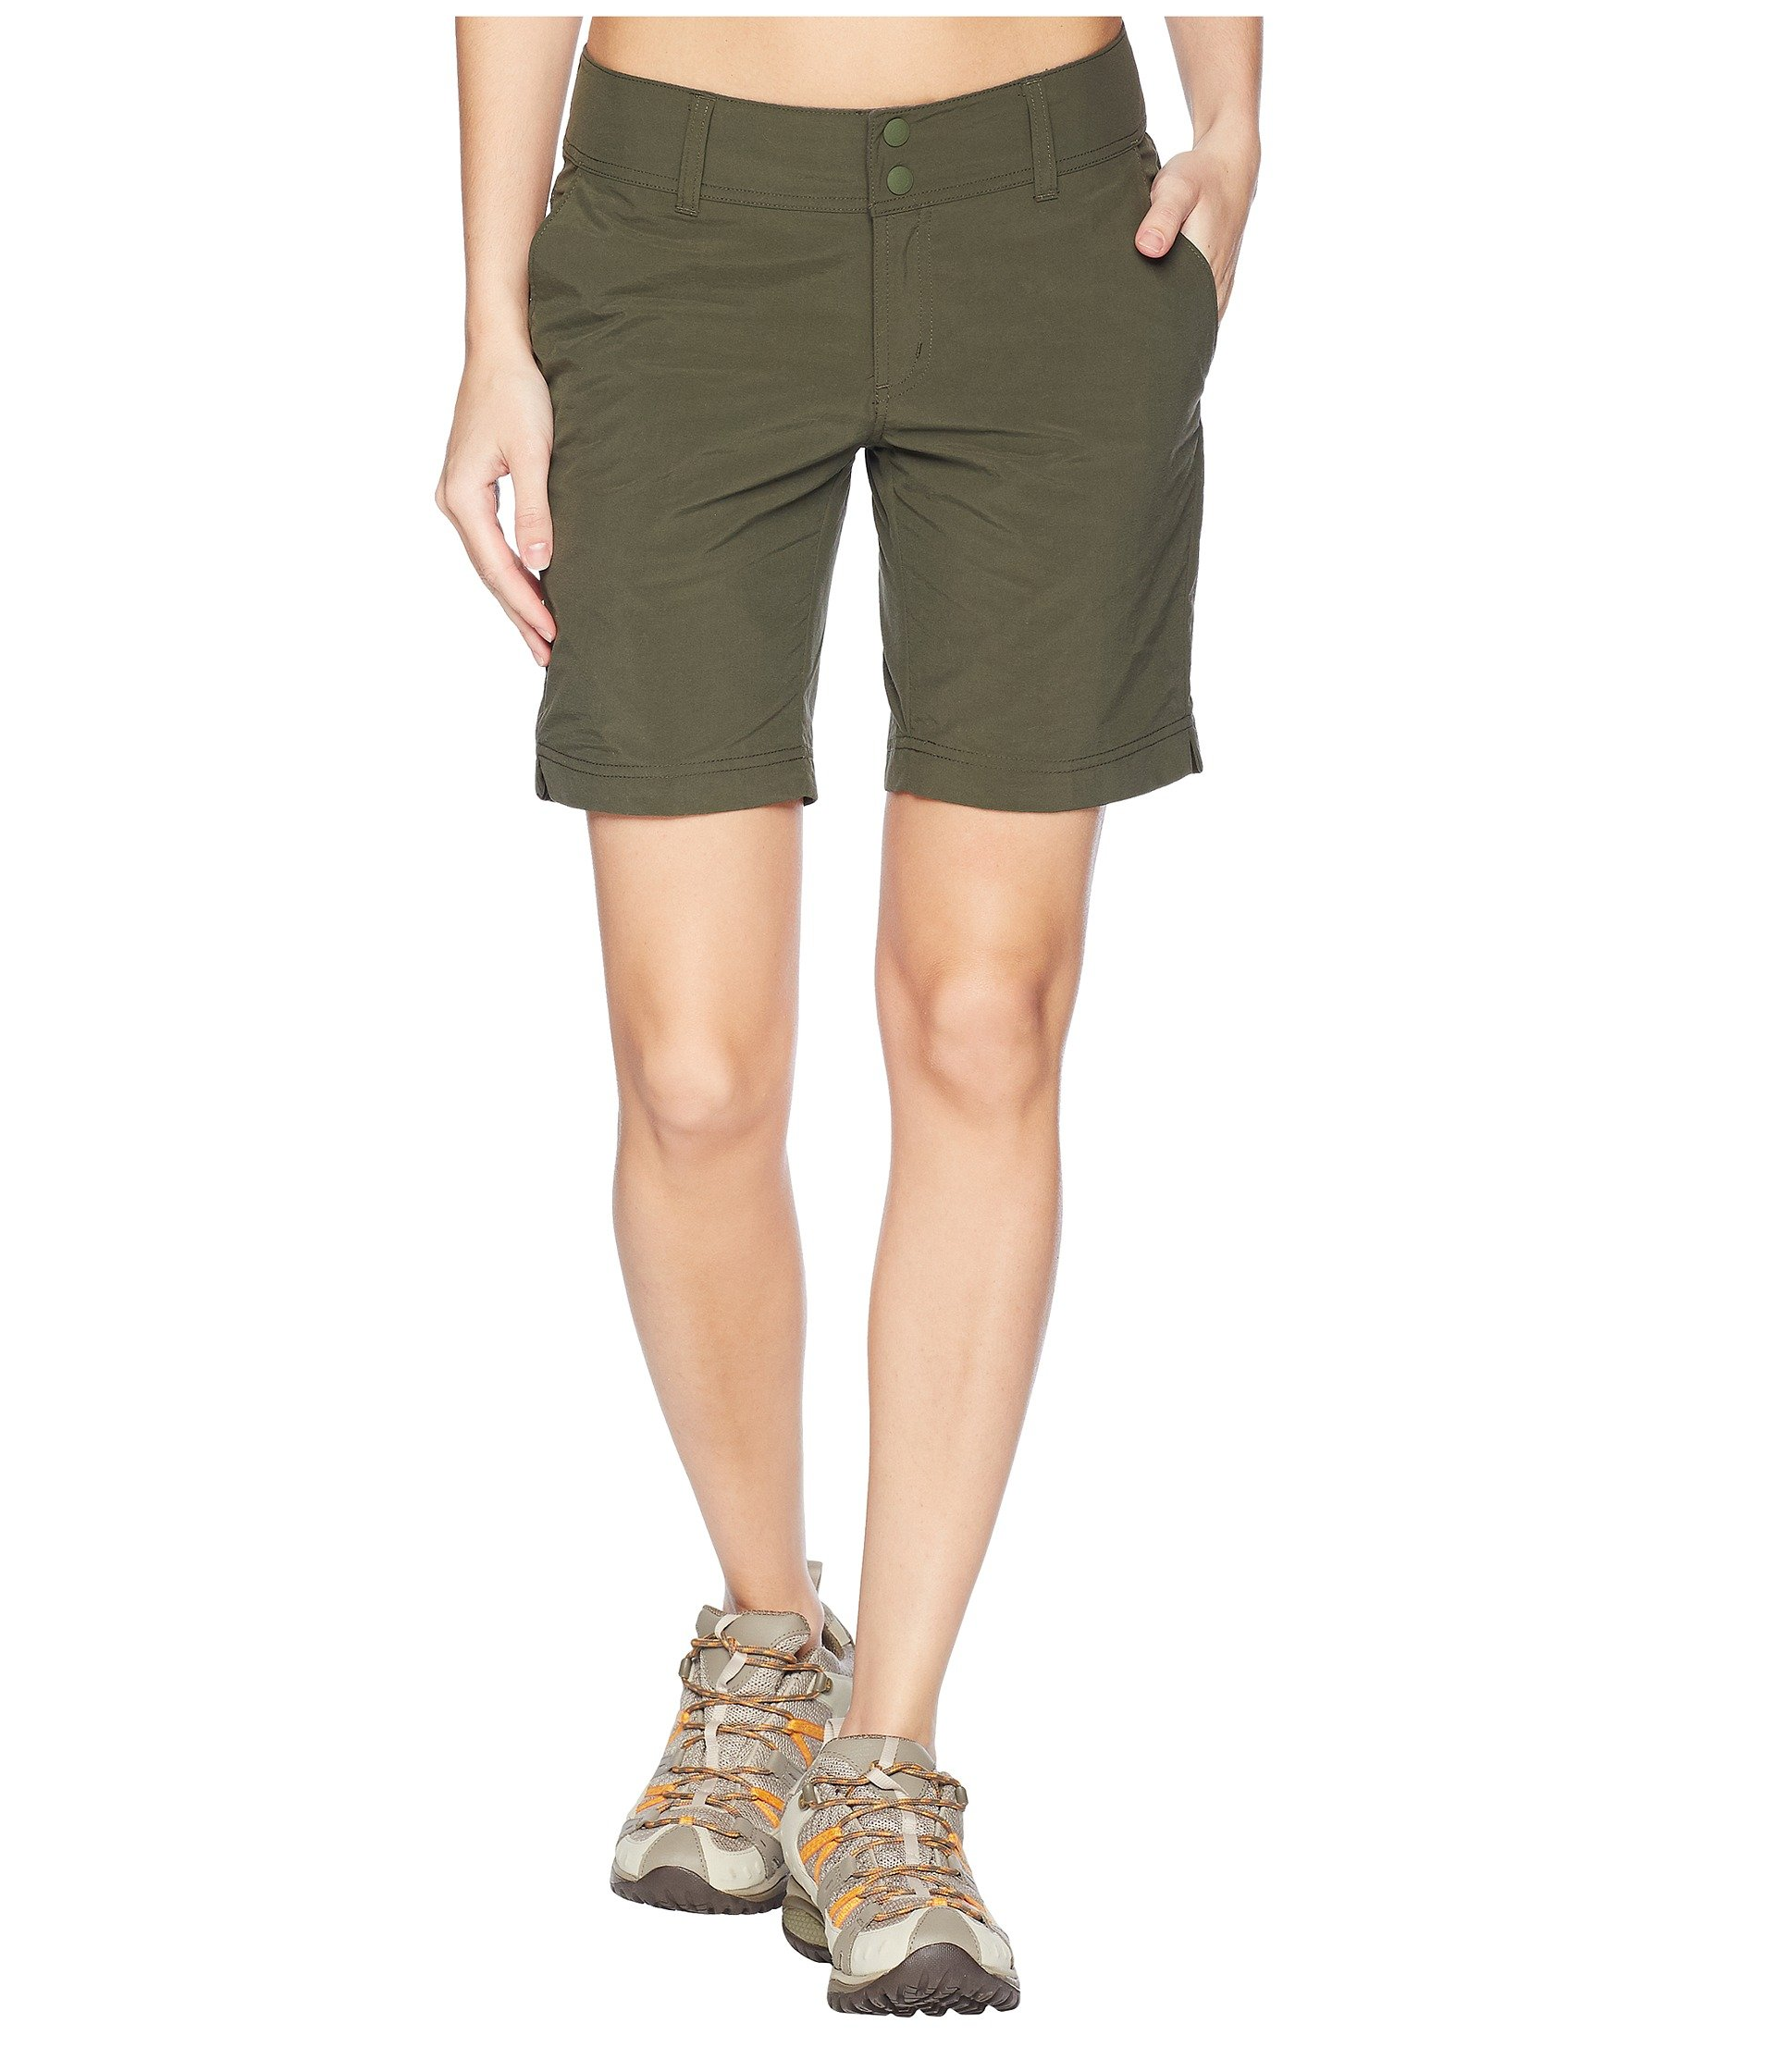 Nomad Shorts Nori Exofficio Cool Sol 0qwxnP61YE